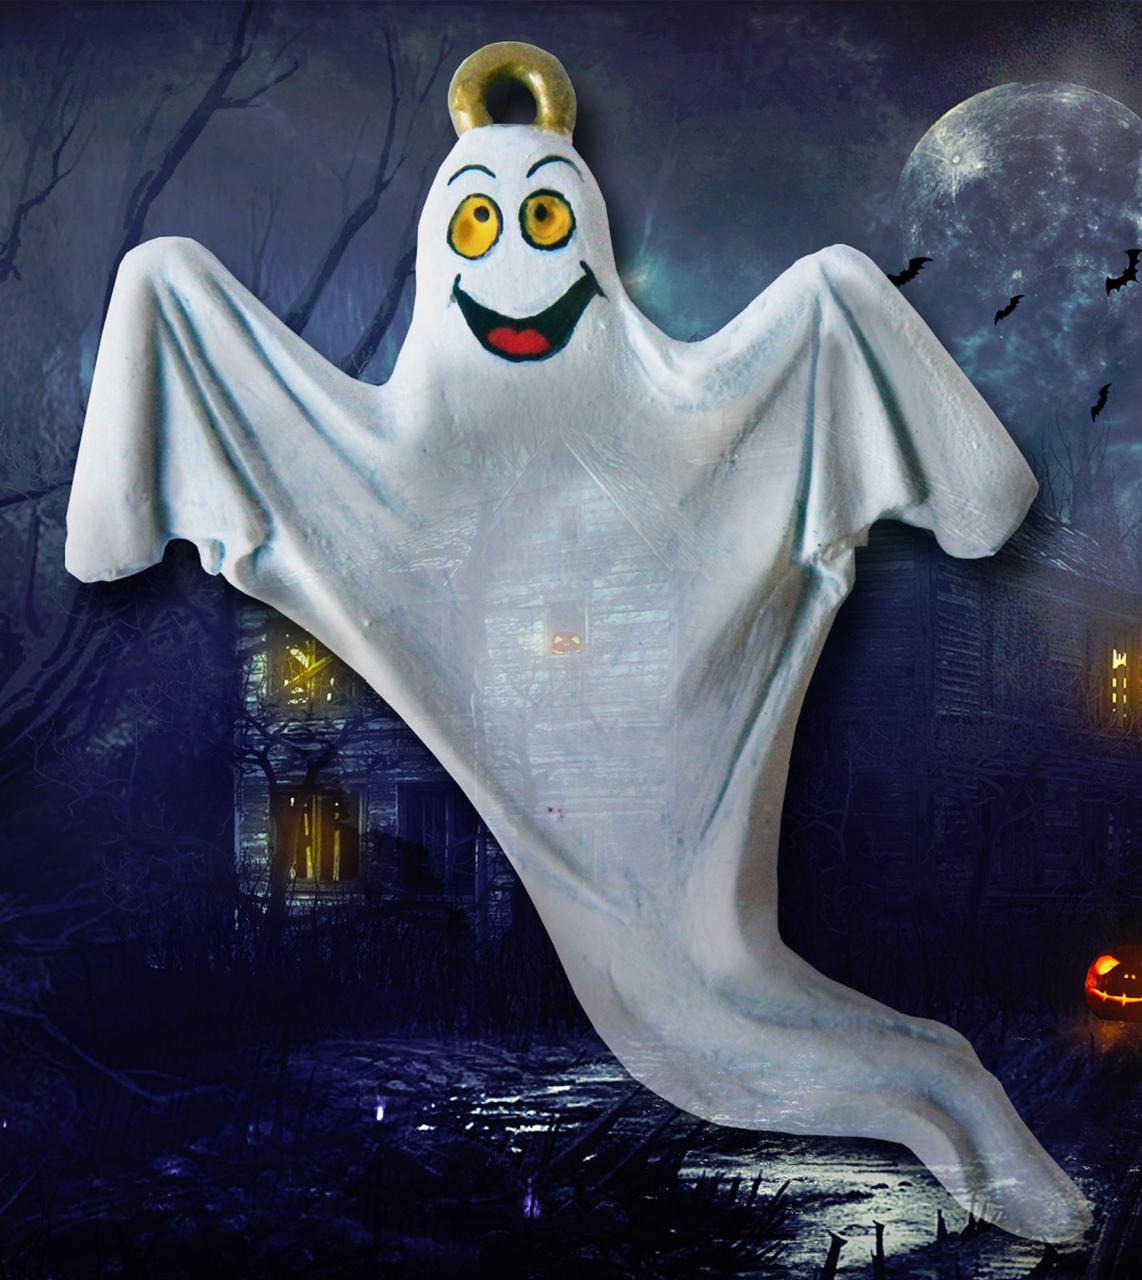 30 Min Halloween Make and Paint